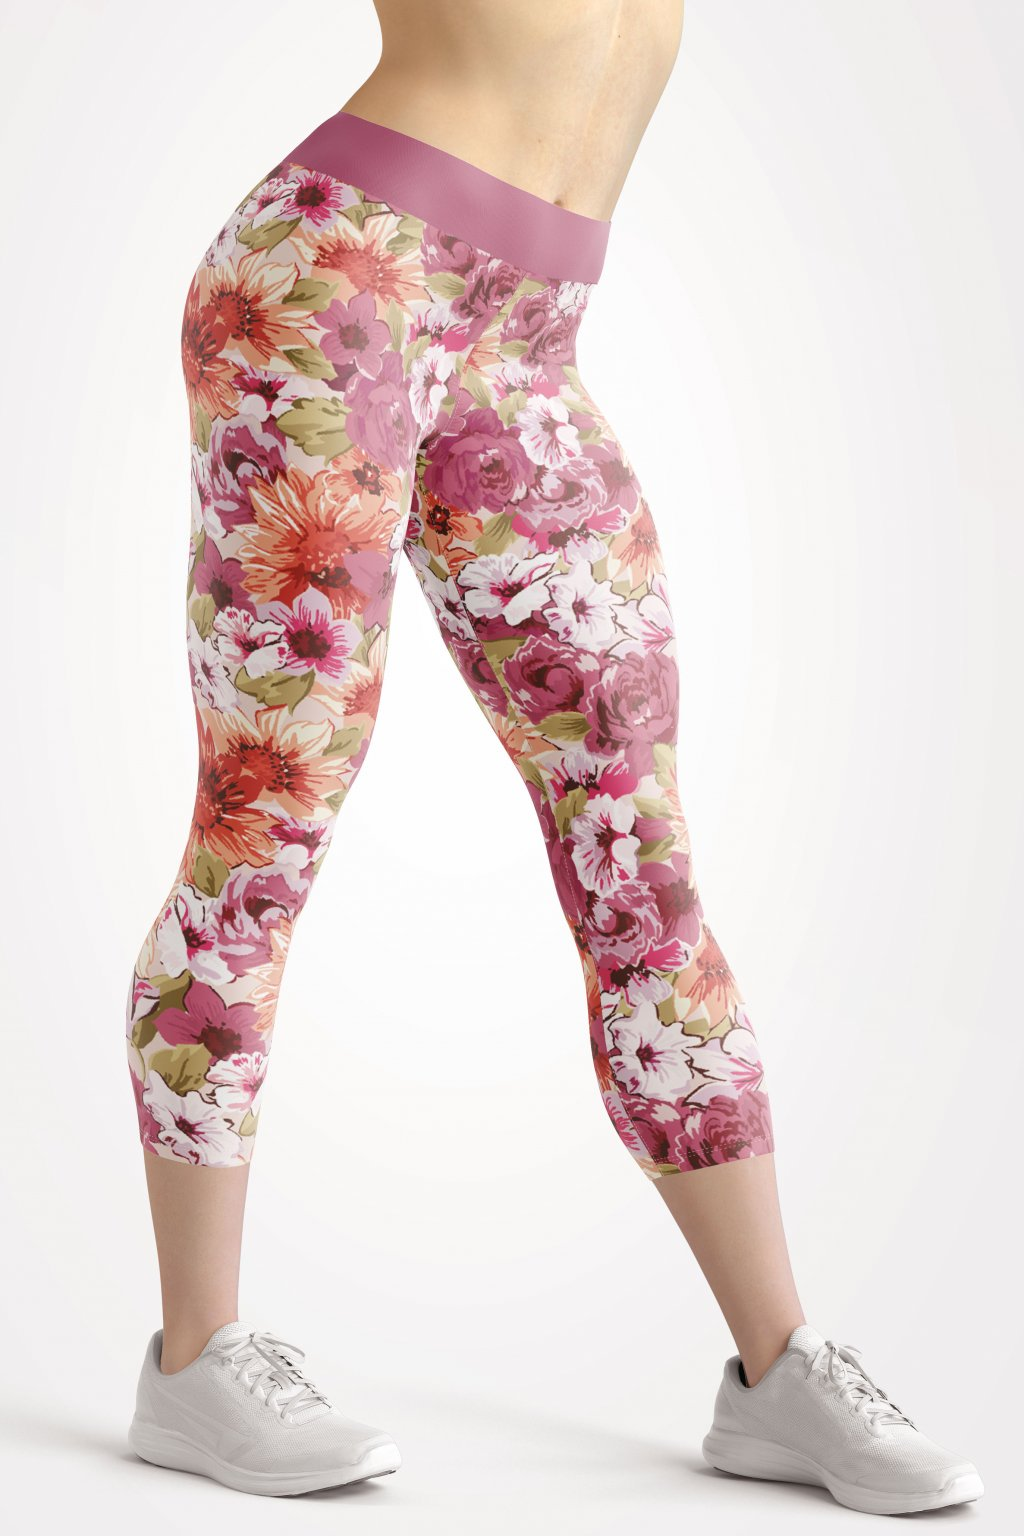 rozes 3 4 leggings front by utopy